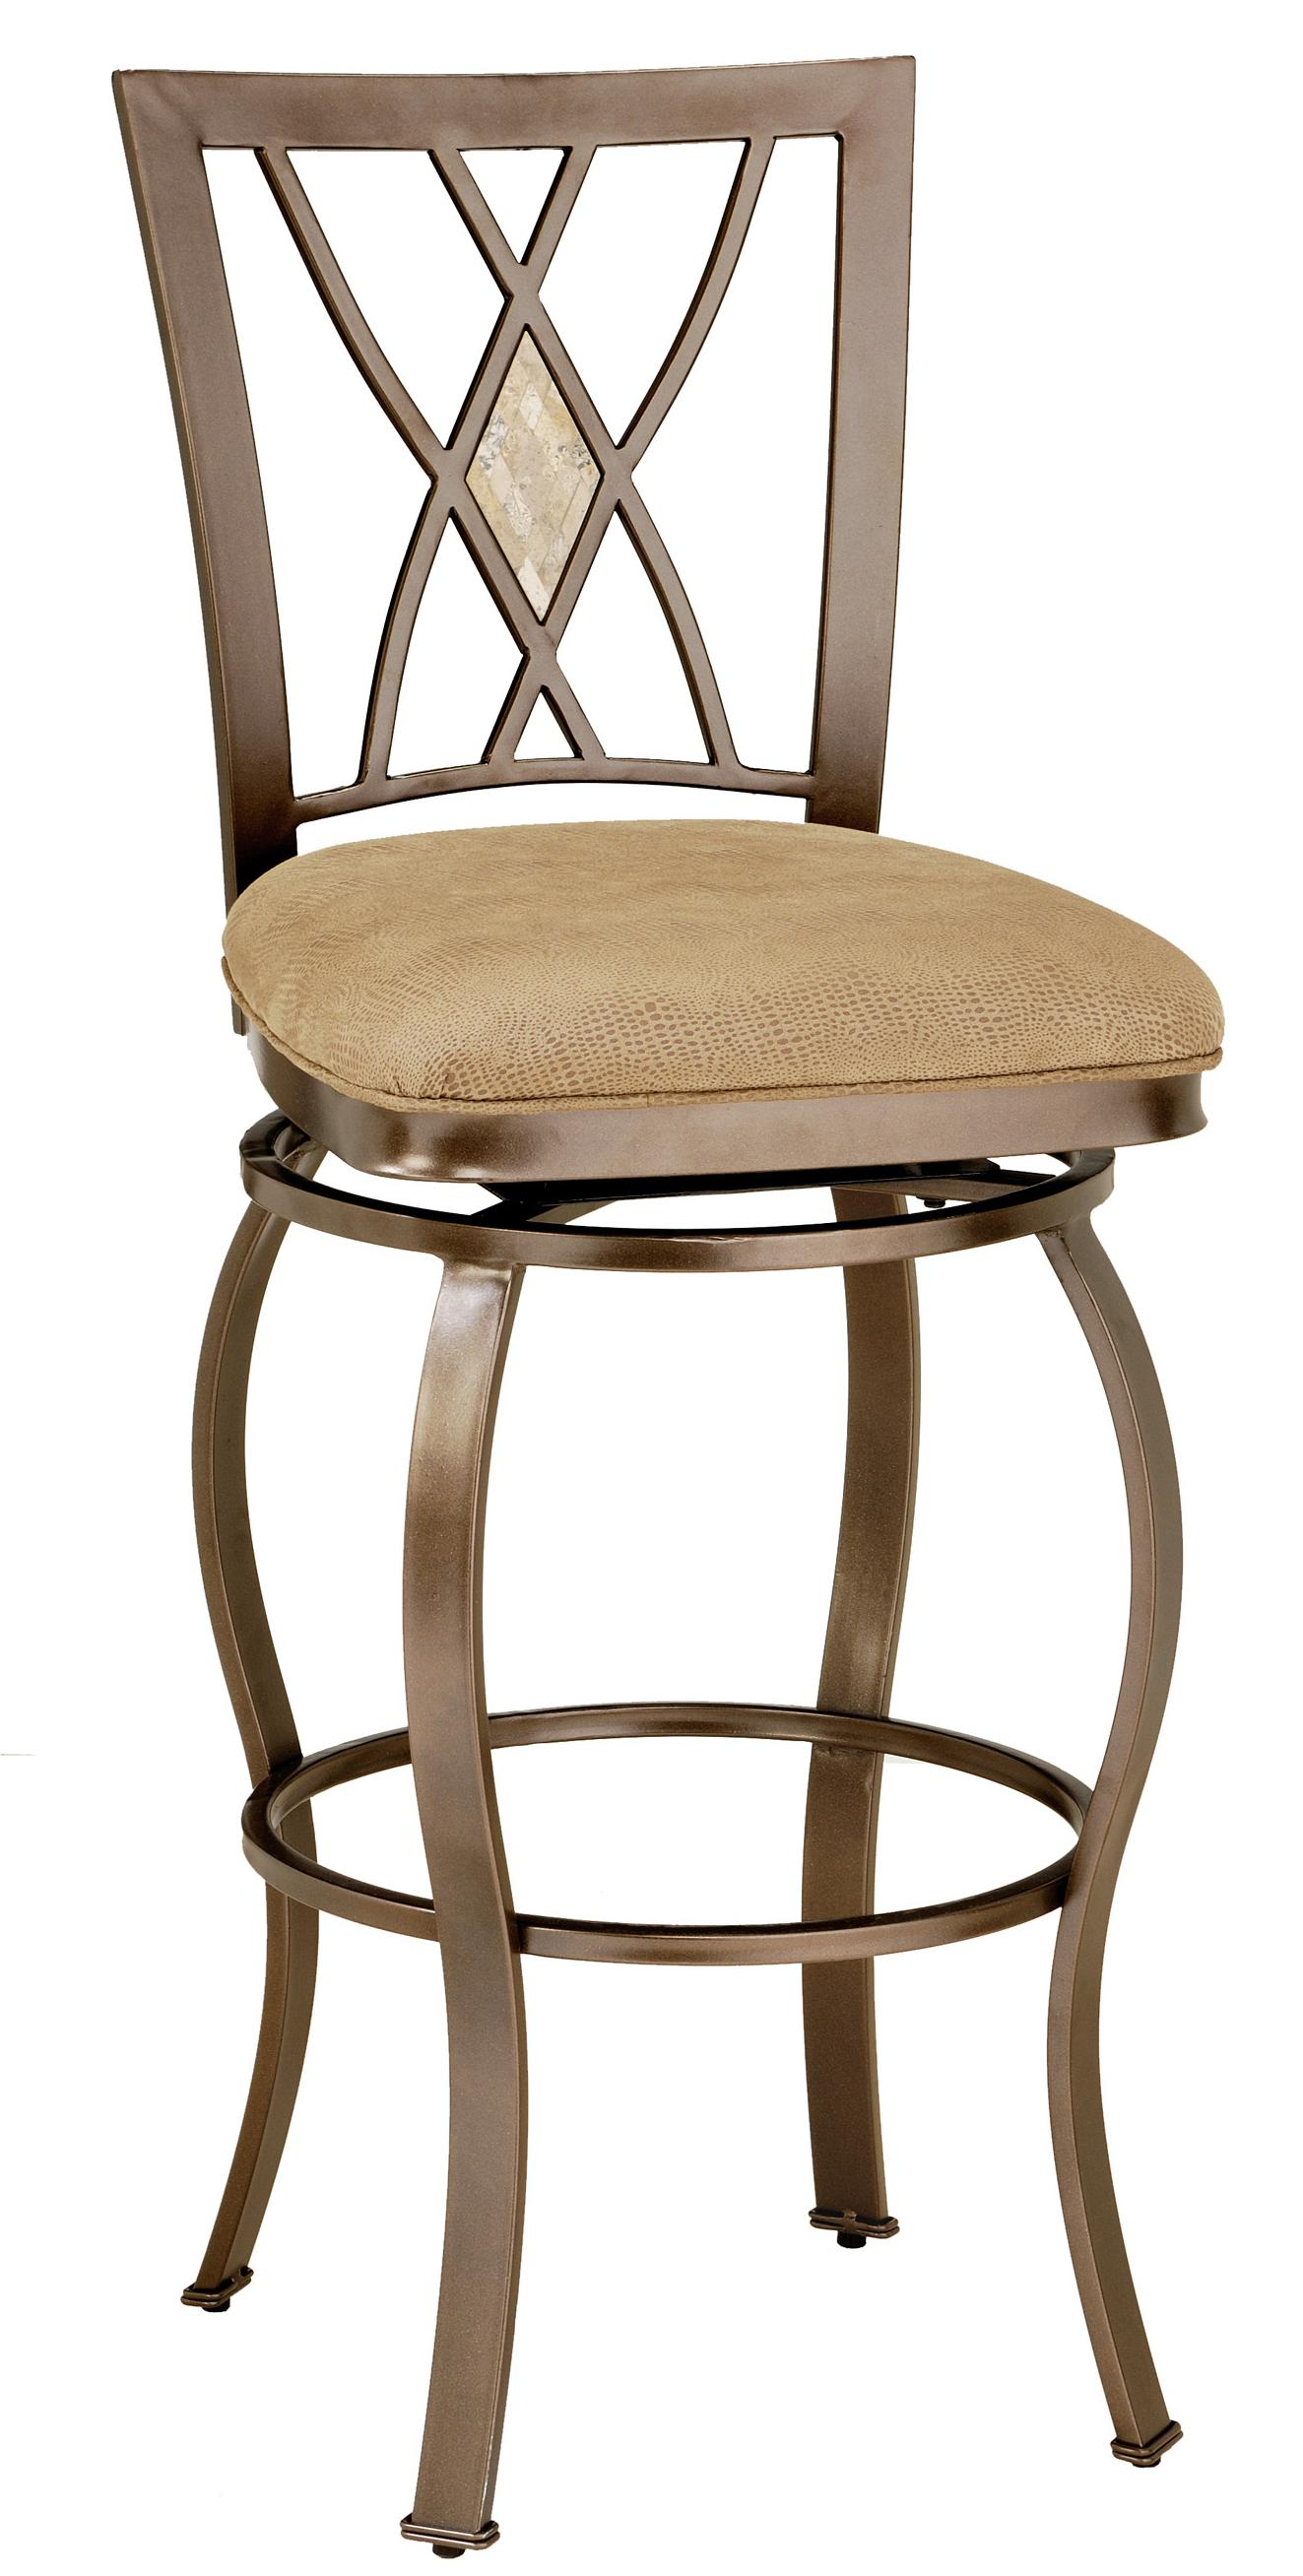 counter height bar chairs ergonomic chair journal 30 quot brookside diamond fossil back swivel